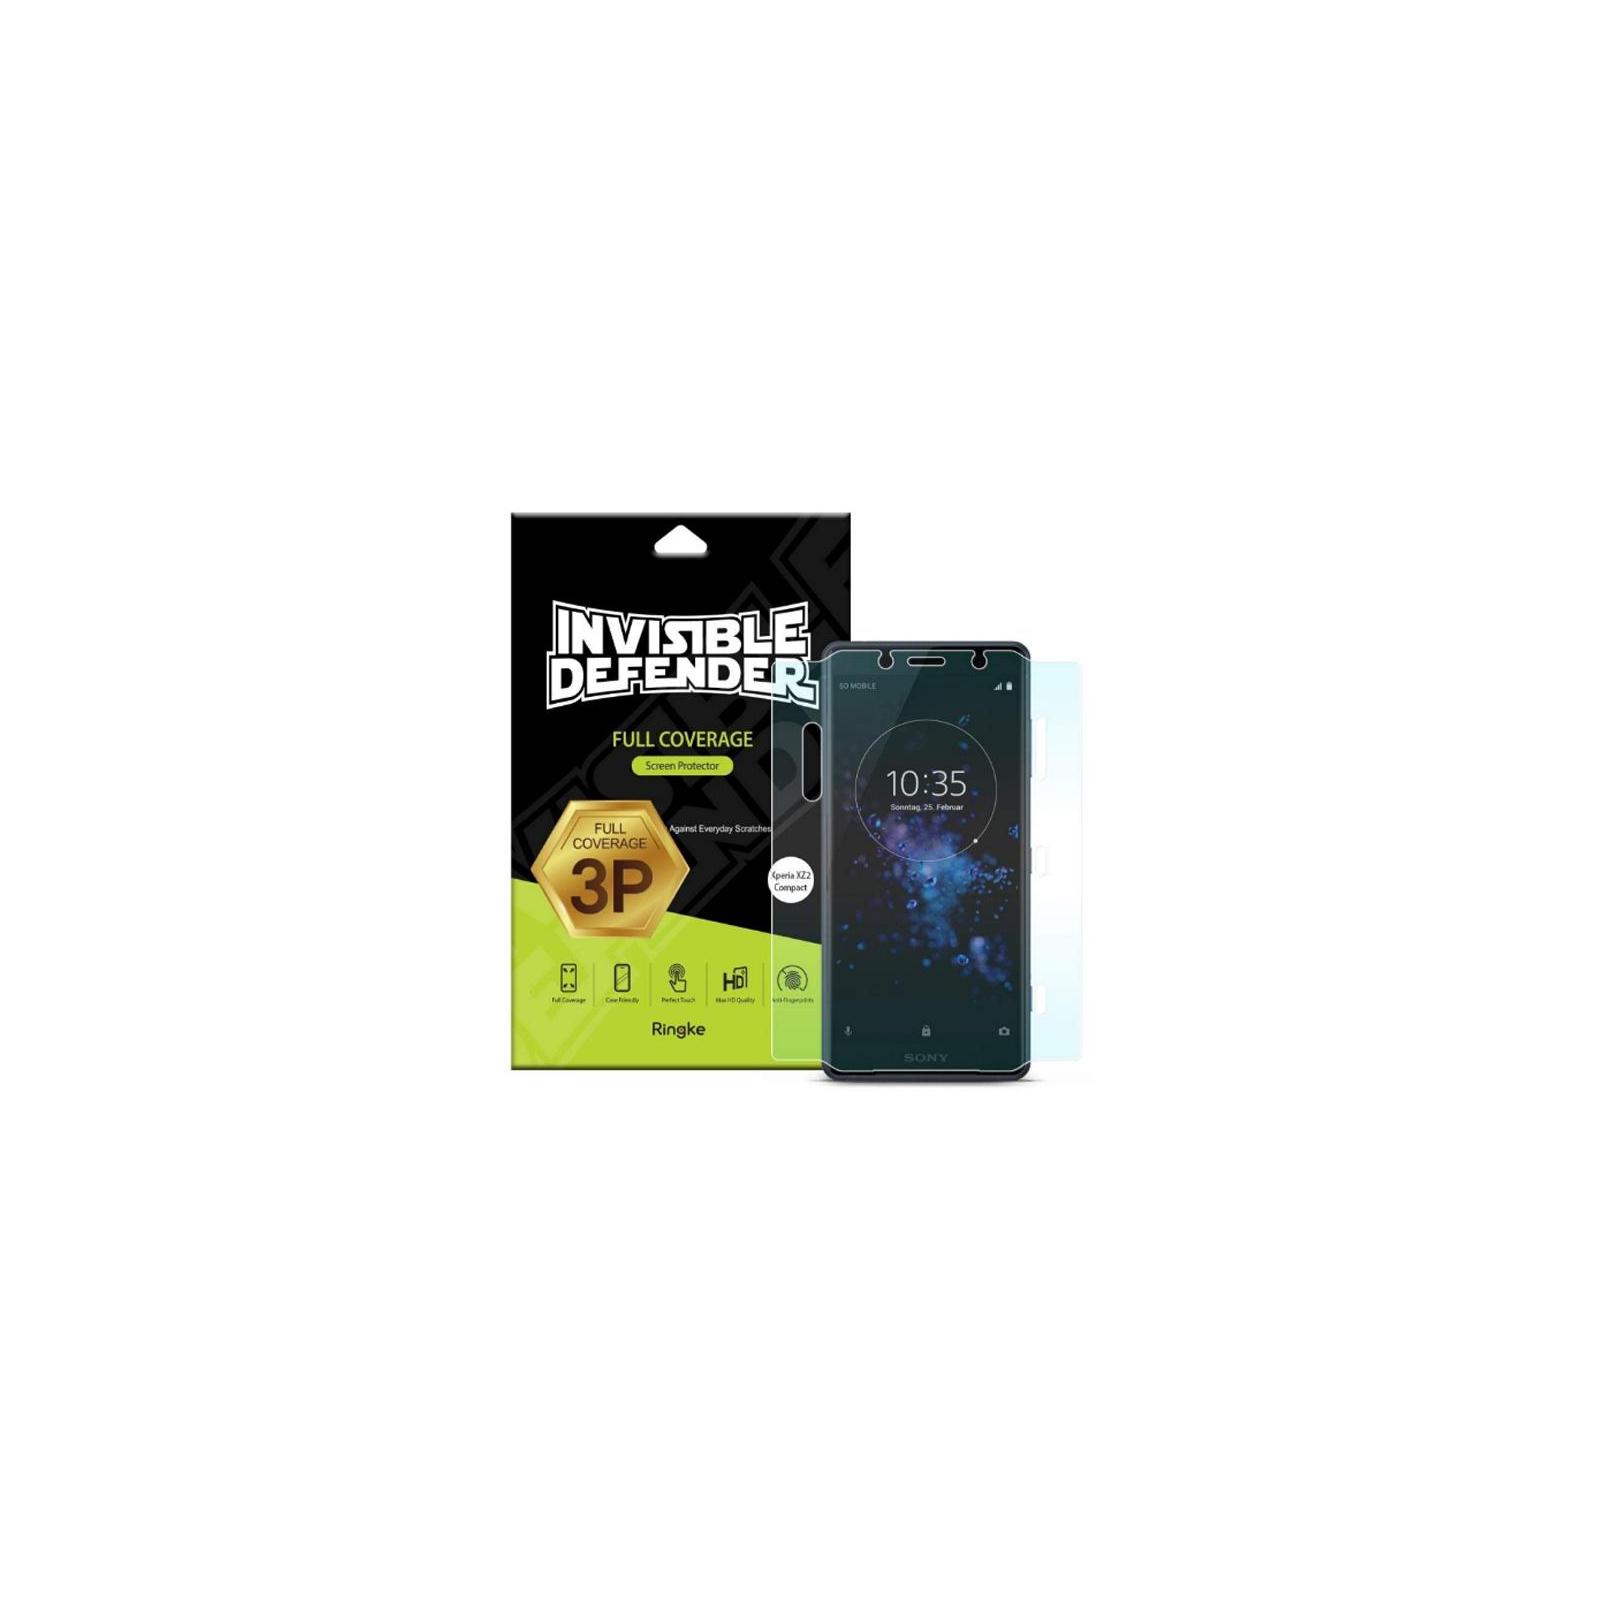 Пленка защитная Ringke для телефона Sony Xperia XZ2 Compact Full Cover (RSP4456)